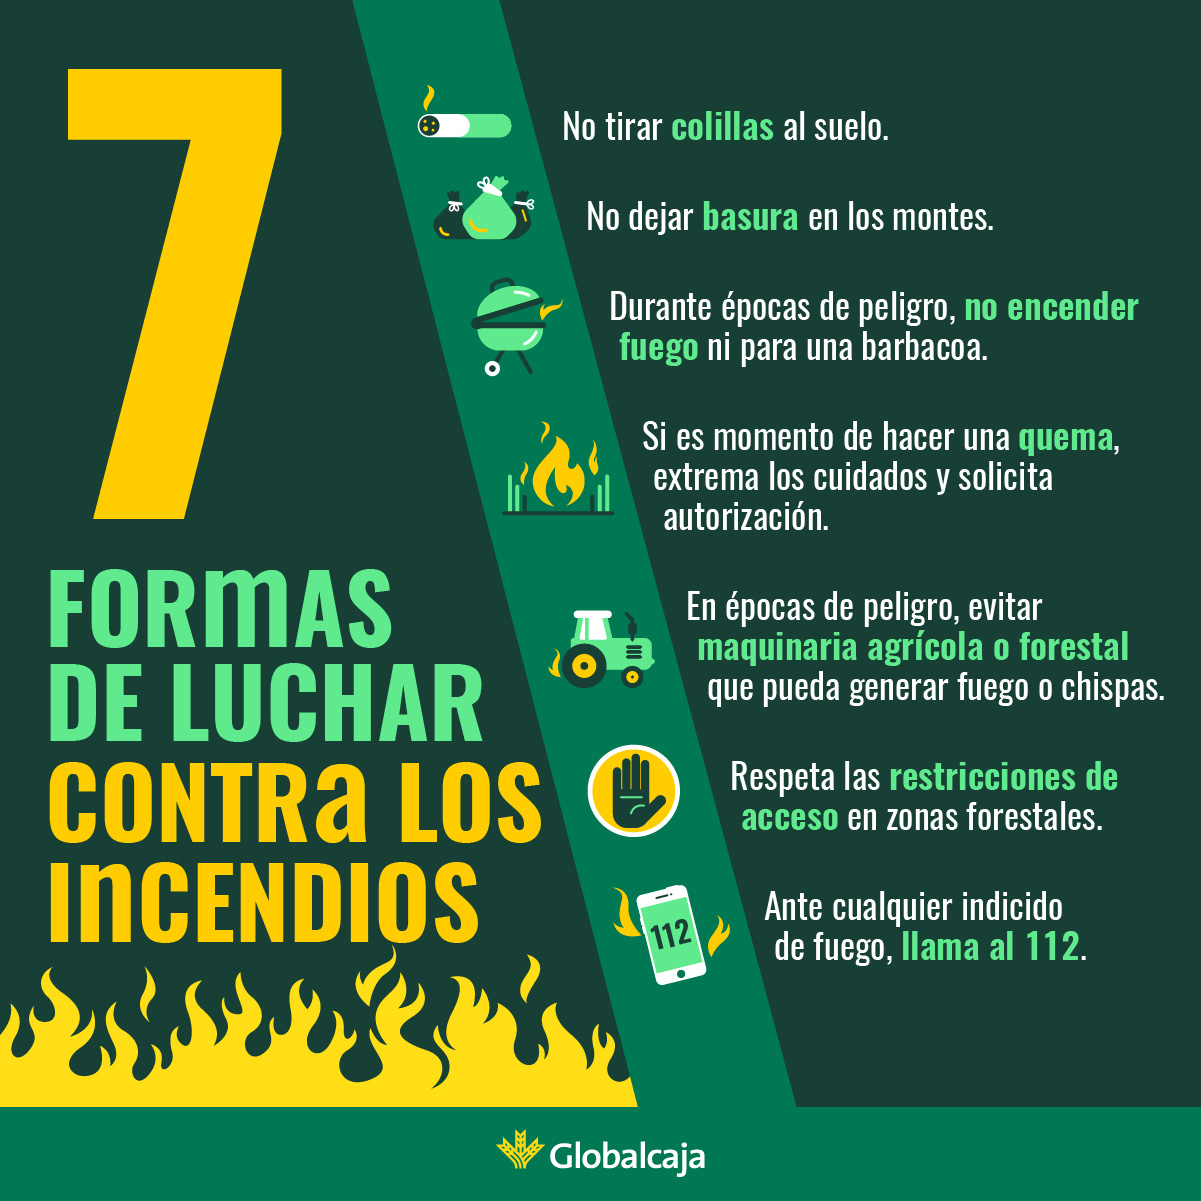 consejos para prevenir incendios forestales